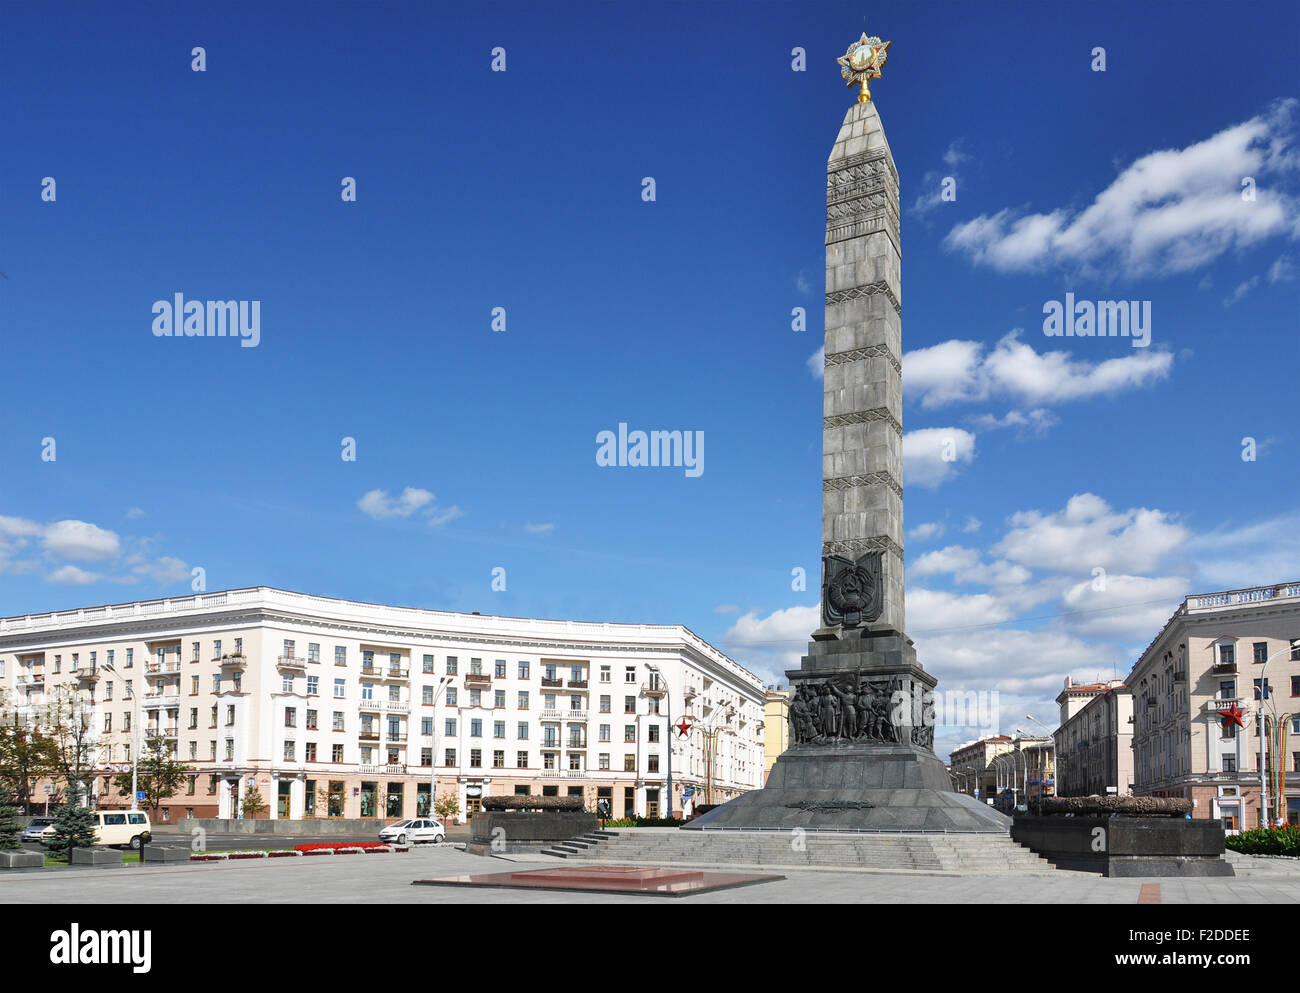 Victory square in Minsk, Belarus - Stock Image